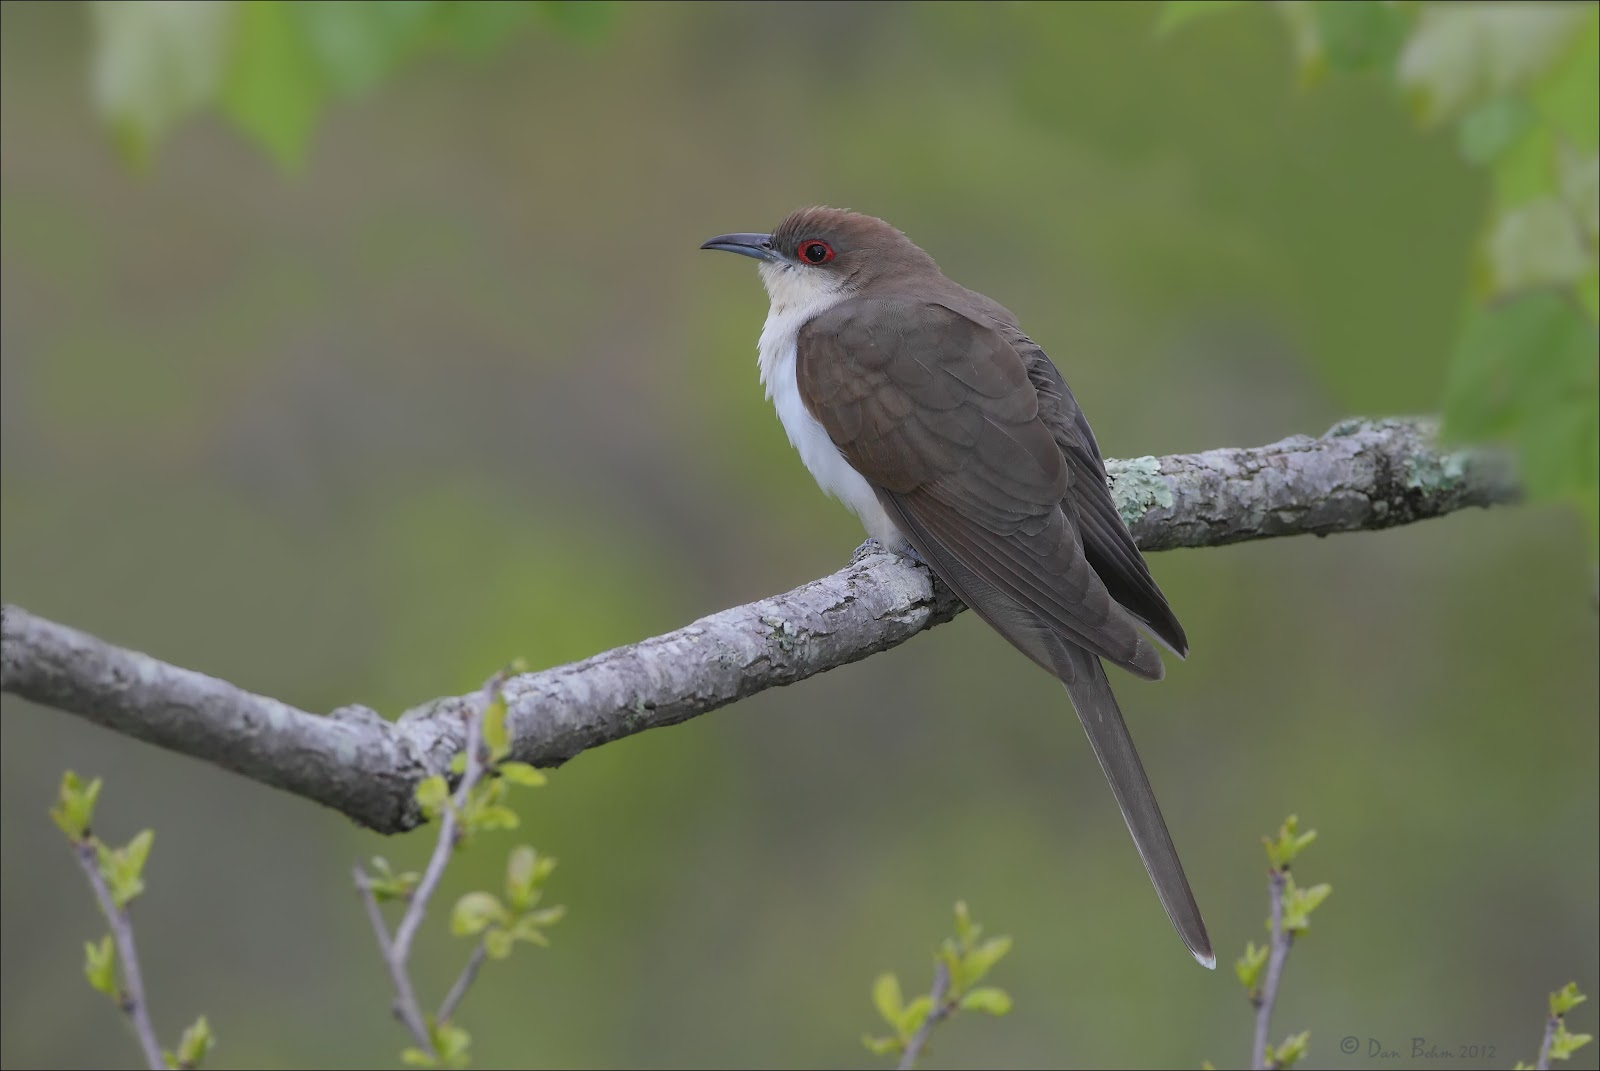 Black cuckoo bird - photo#19